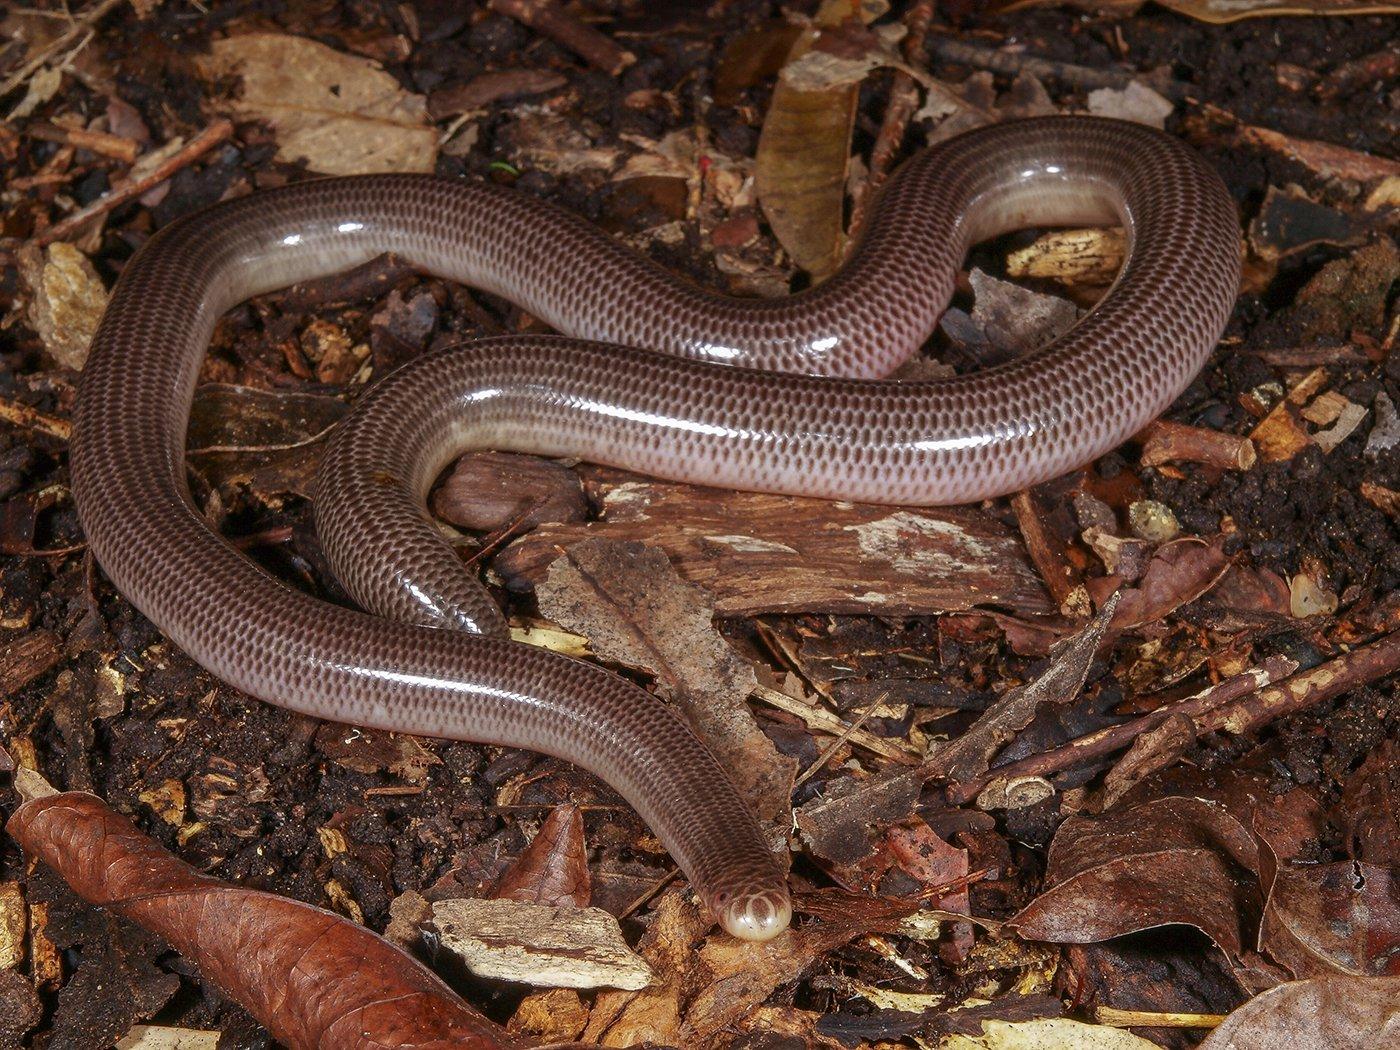 Blind Snake, Anilios nigrescens